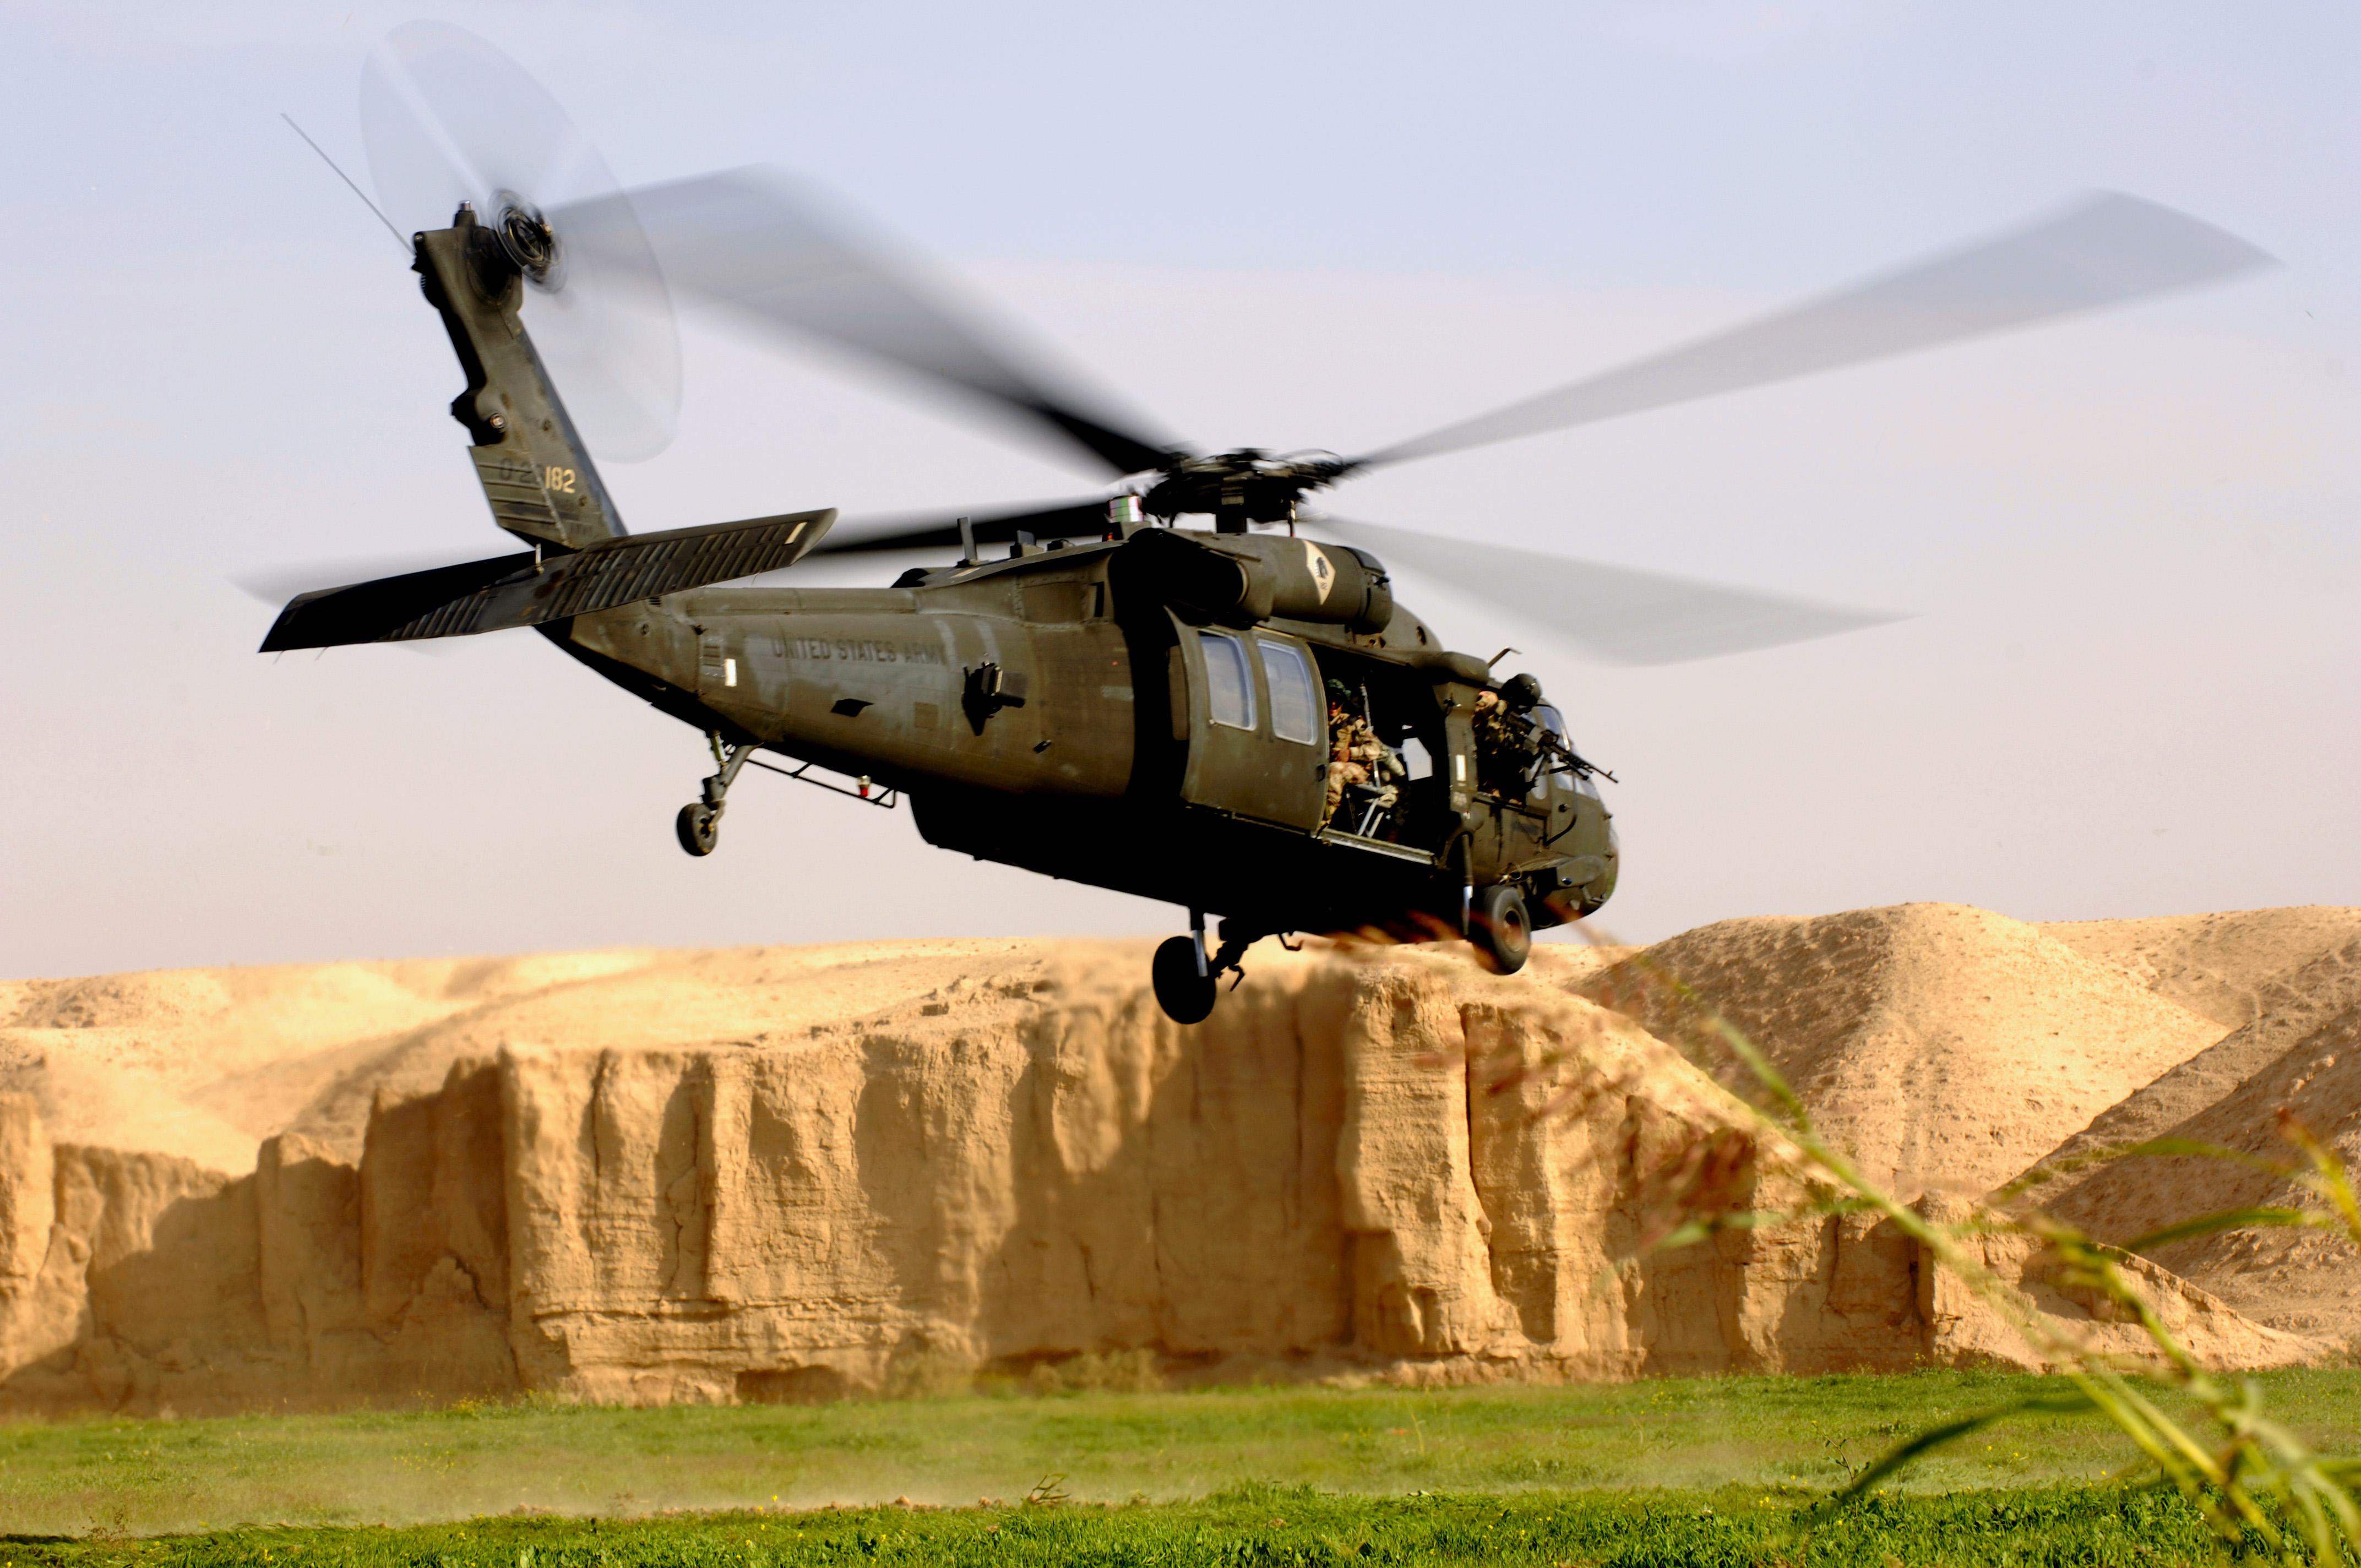 messy-cumshot-black-helicopter-pictures-naked-samoan-boys